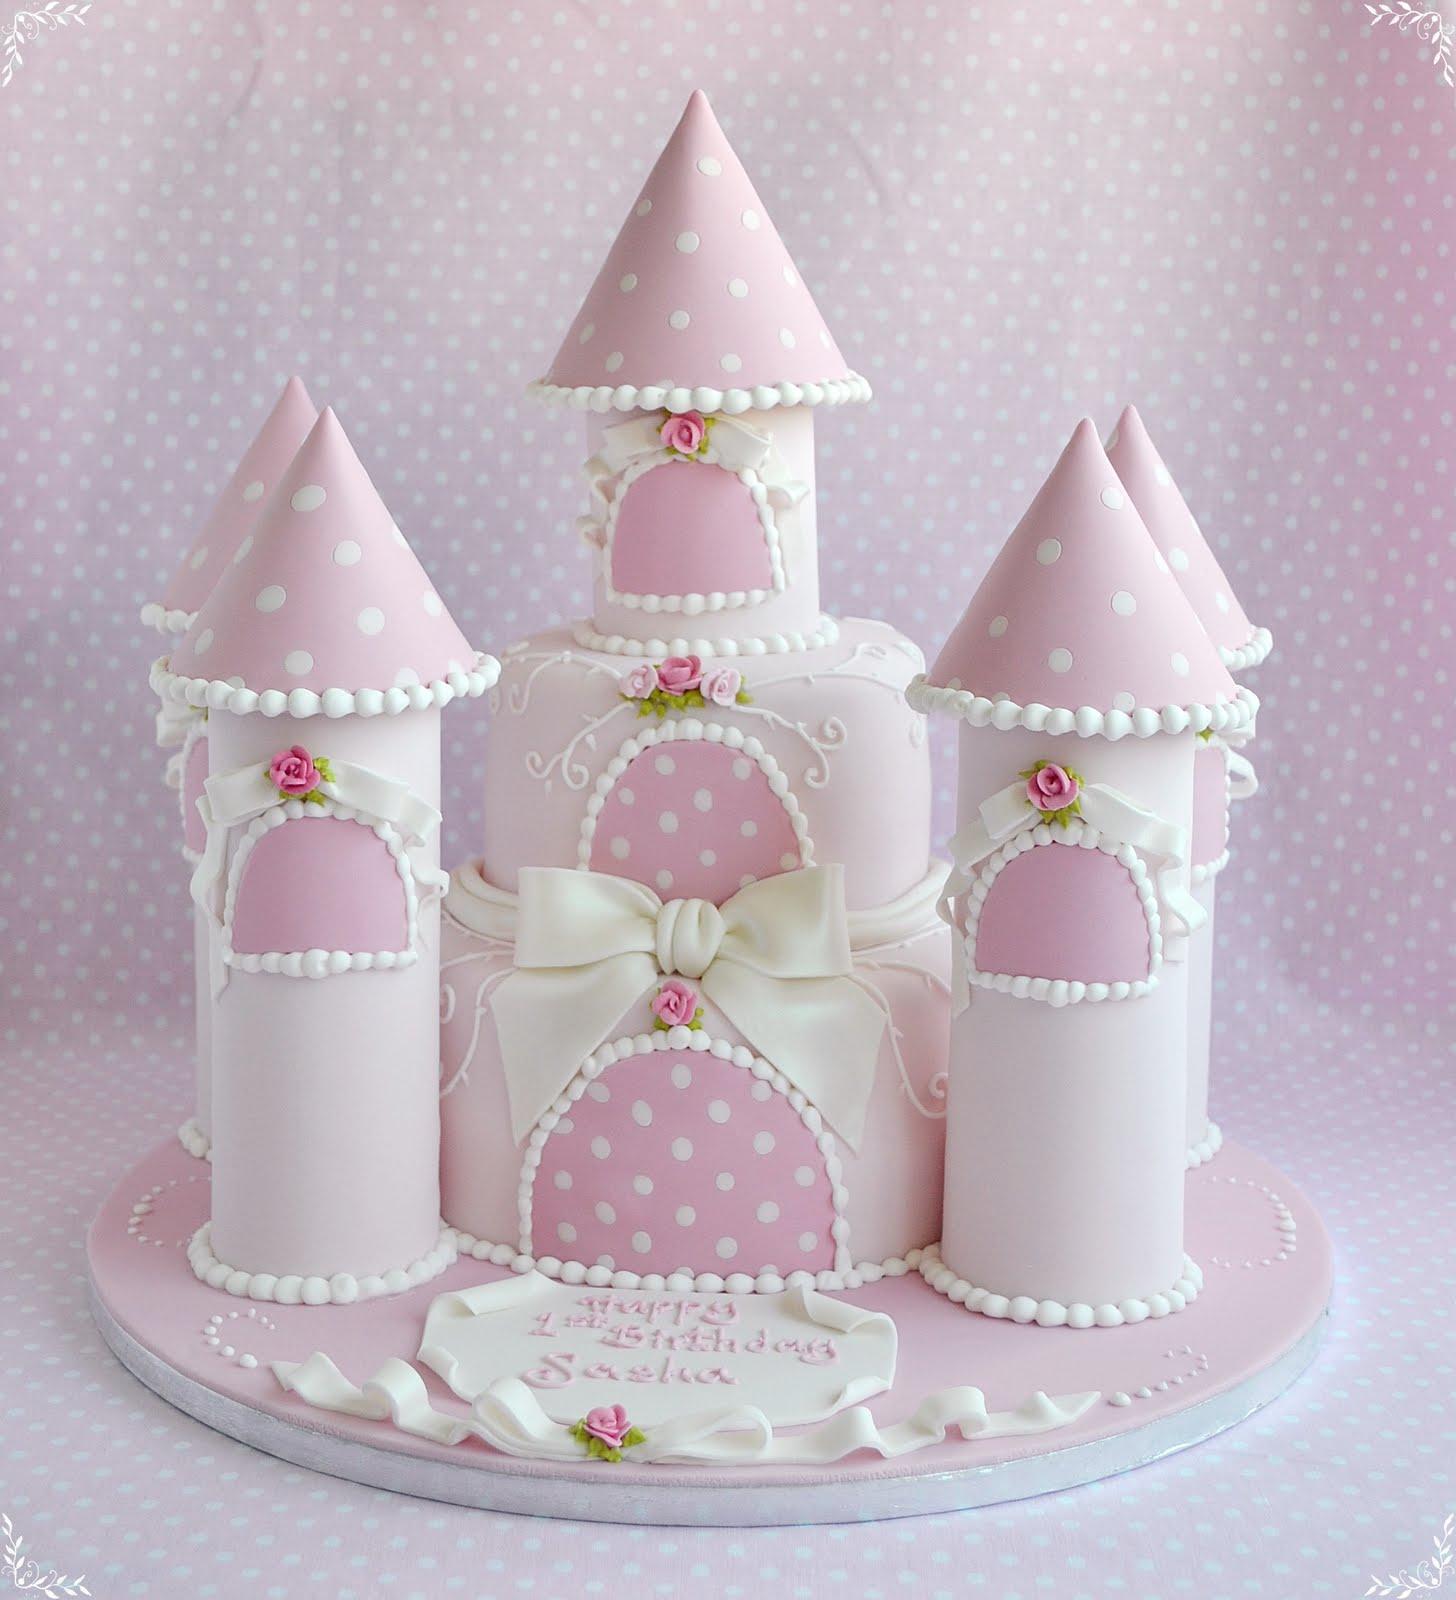 Supermarket Castle Cake